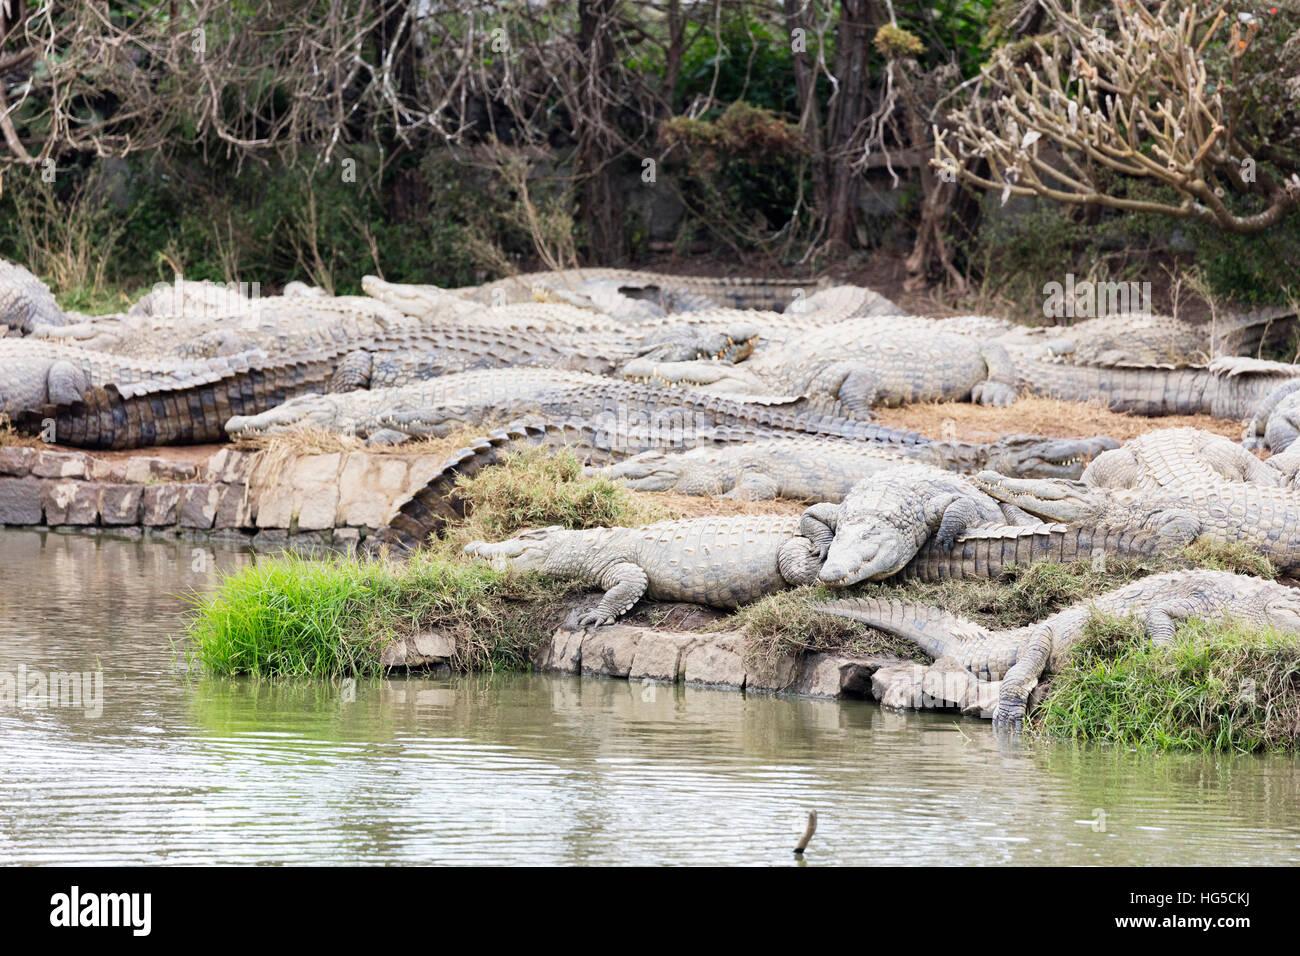 Crocodile Farm, Nile crocodile (Crocodylus niloticus), Antananarivo - Stock Image